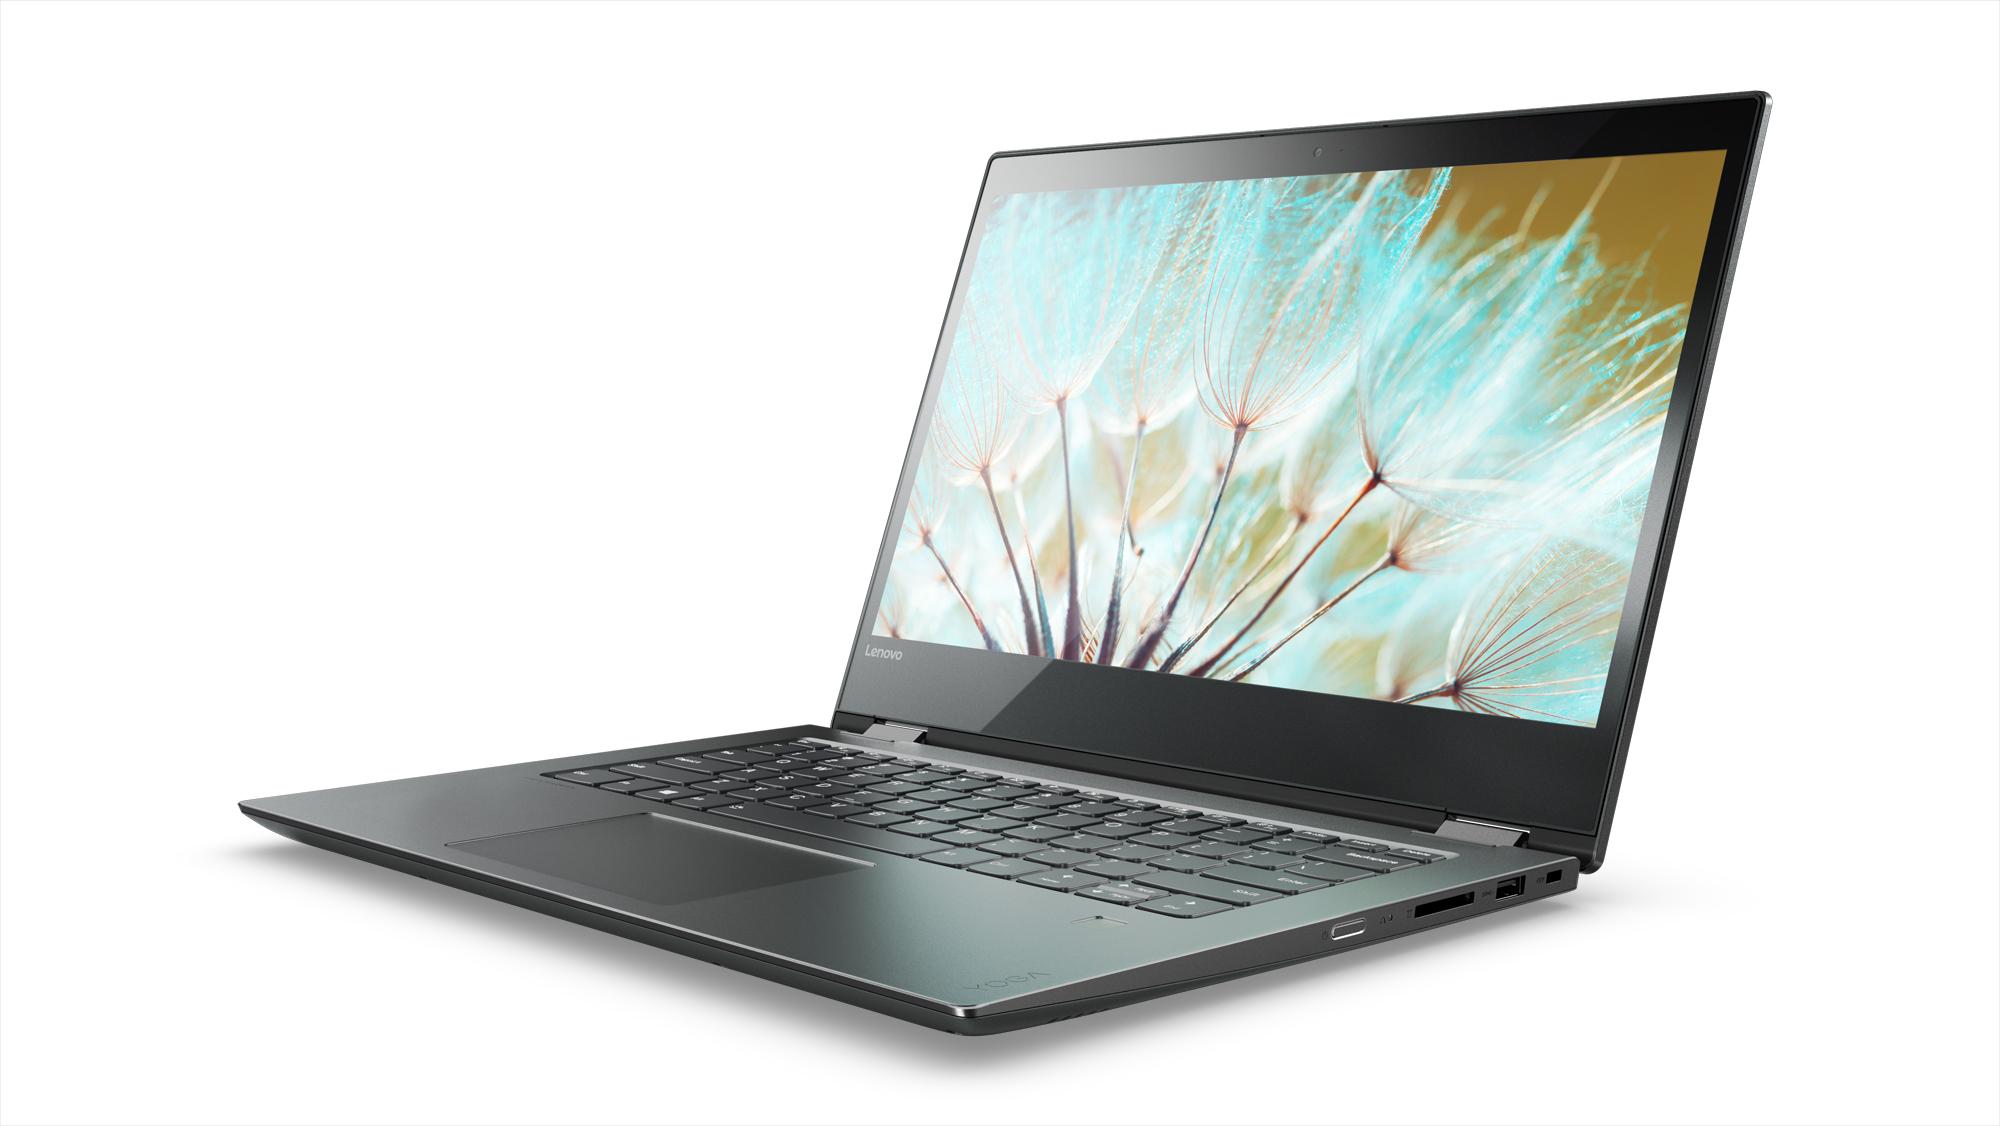 Фото  Ультрабук Lenovo Yoga 520 Onyx Black (81C800CYRA)